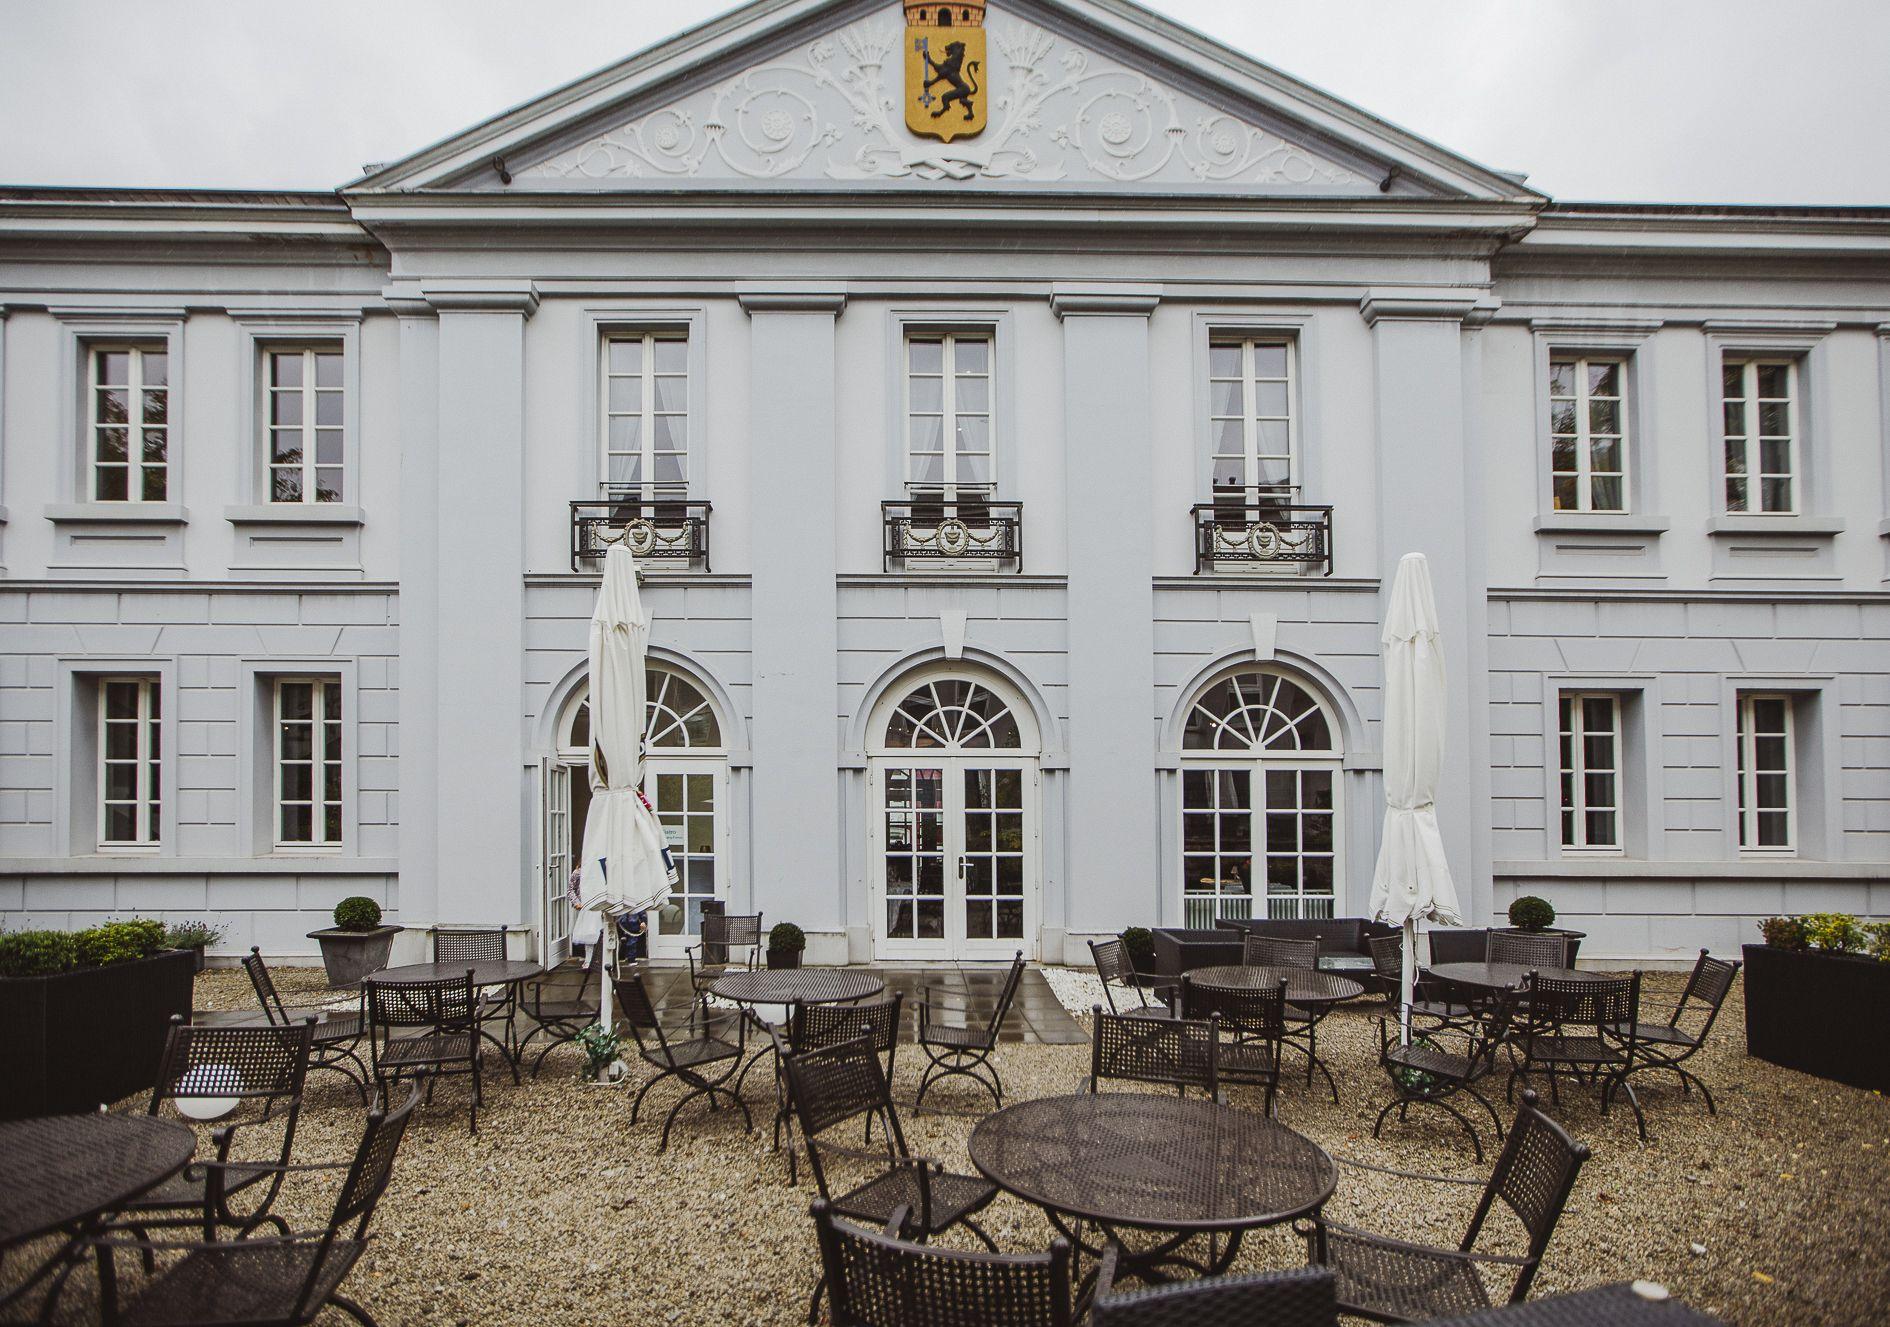 Hotel De Ville Eschweiler Aachen Hochzeit Hochzeitsfotografie Http Www Einblick Liebe De Hochzeitsfotograf Fotograf Hochzeit